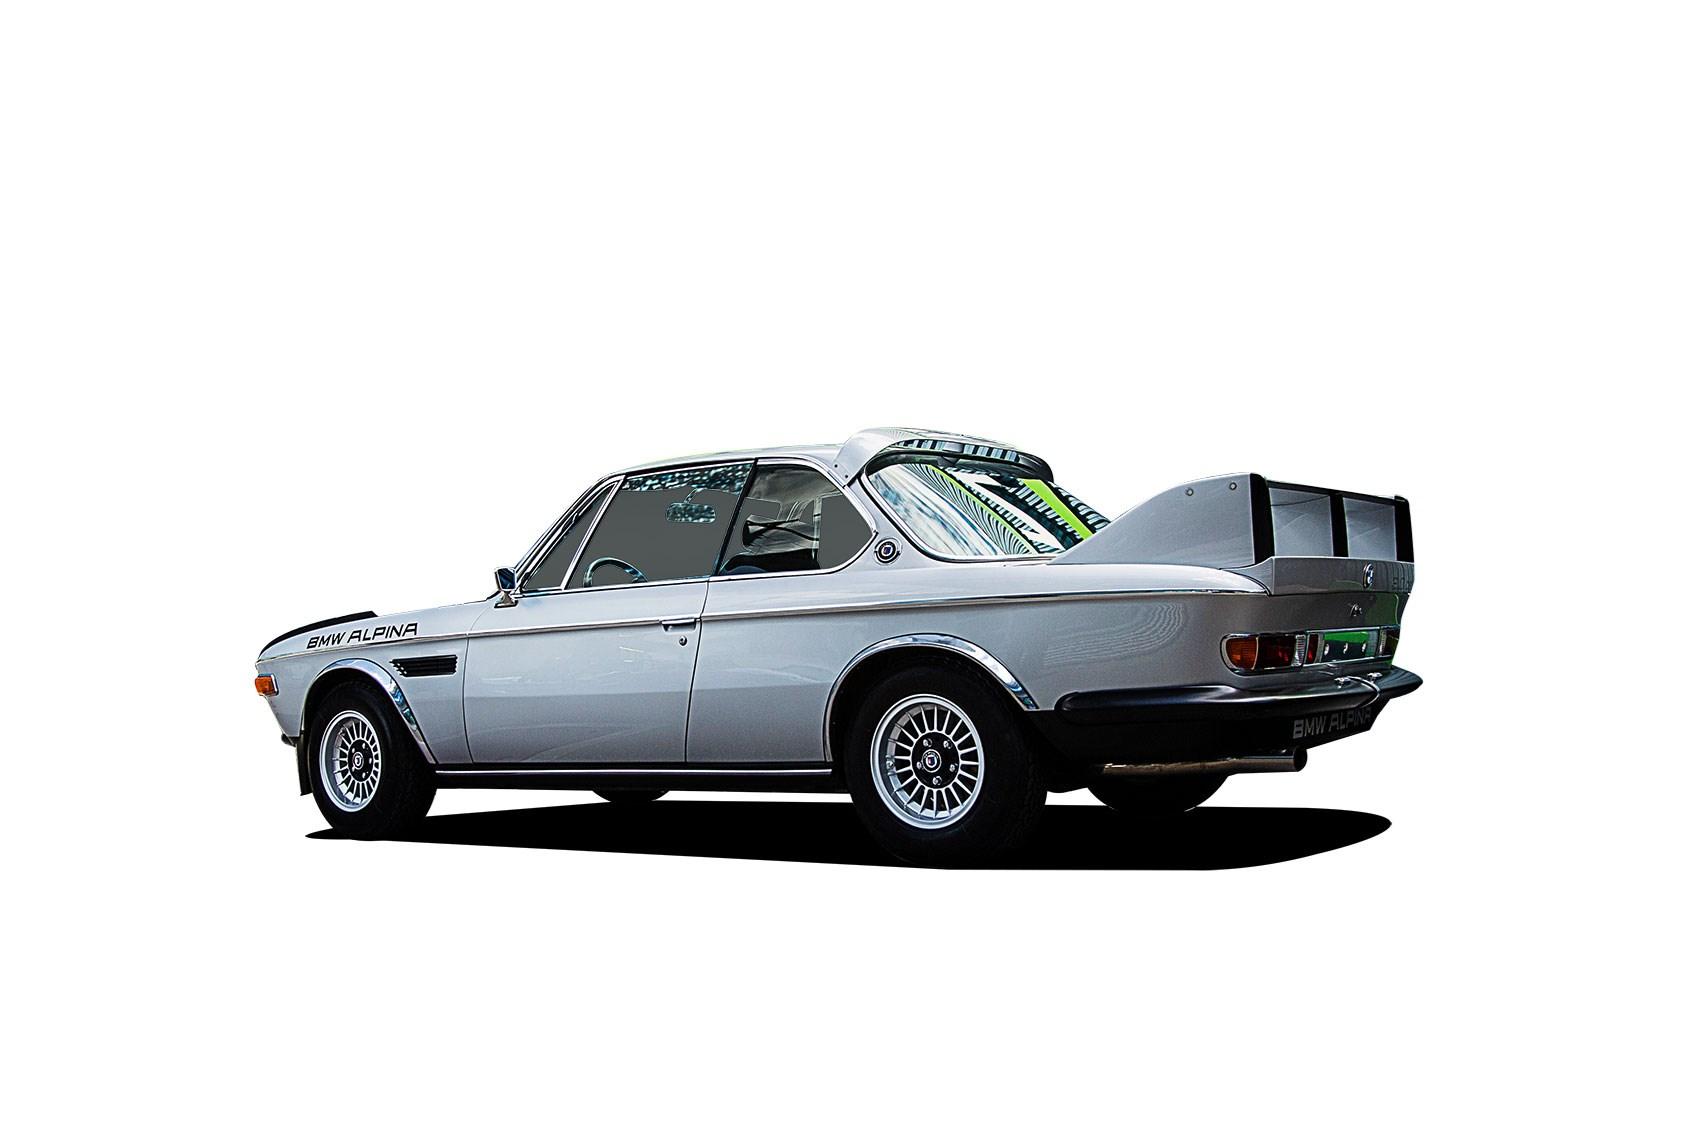 supra auto to manual conversion uk